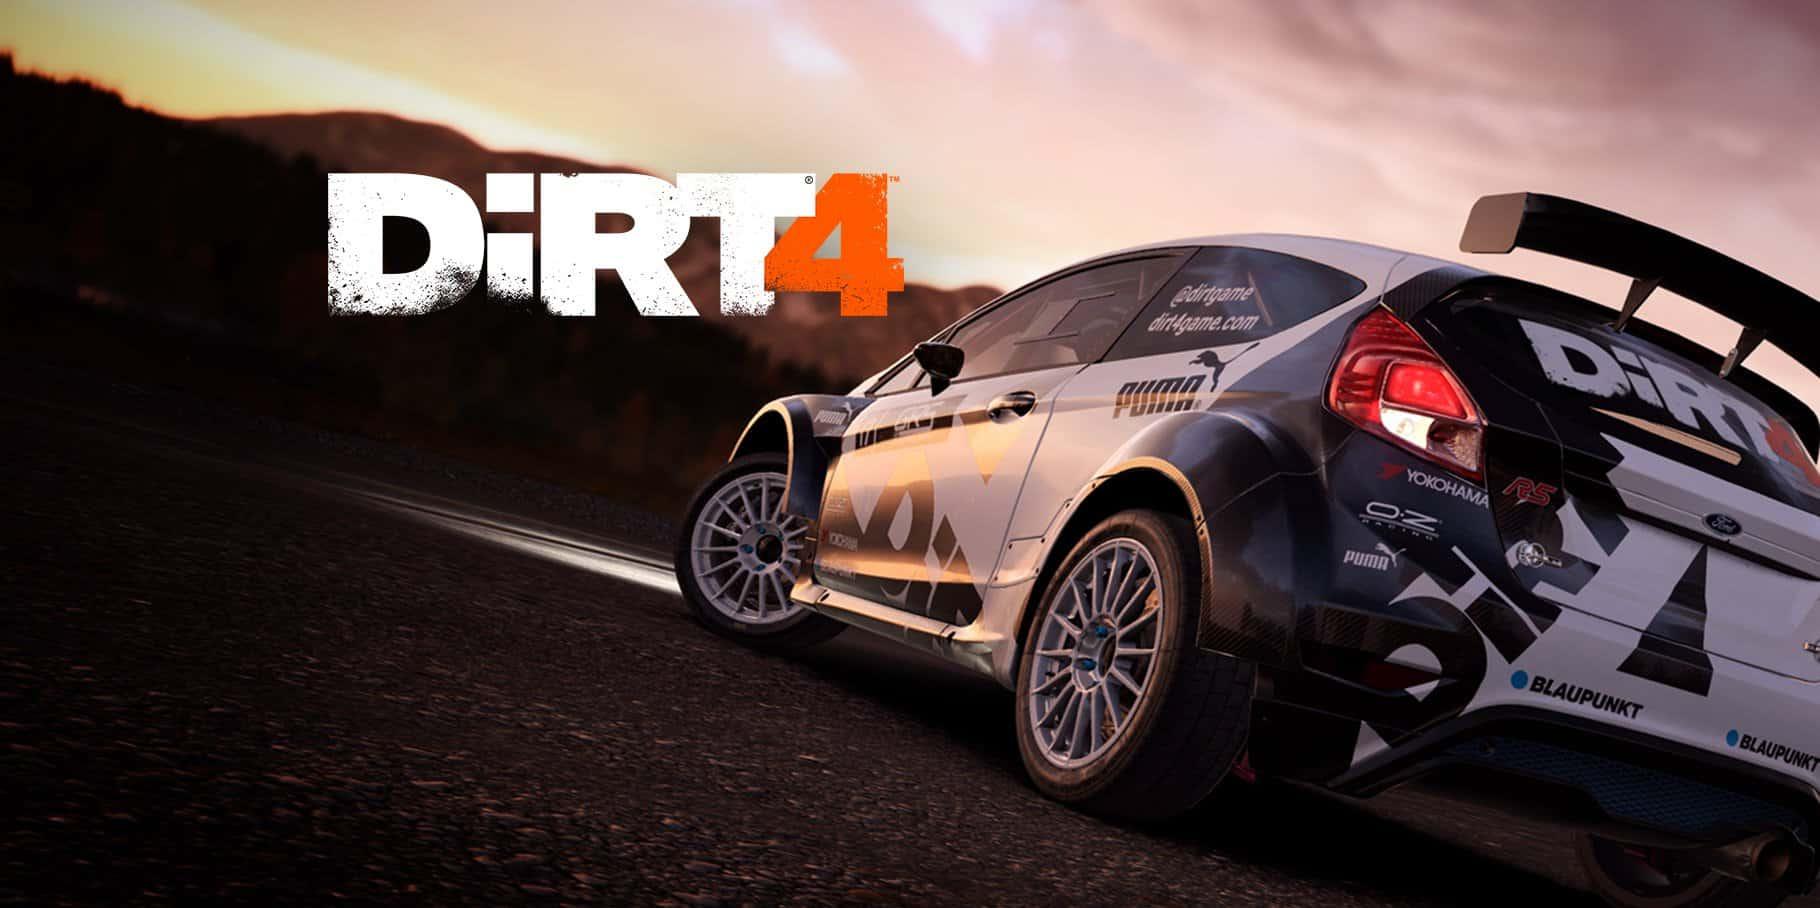 Dirt 4 PC Version Full Game Free Download